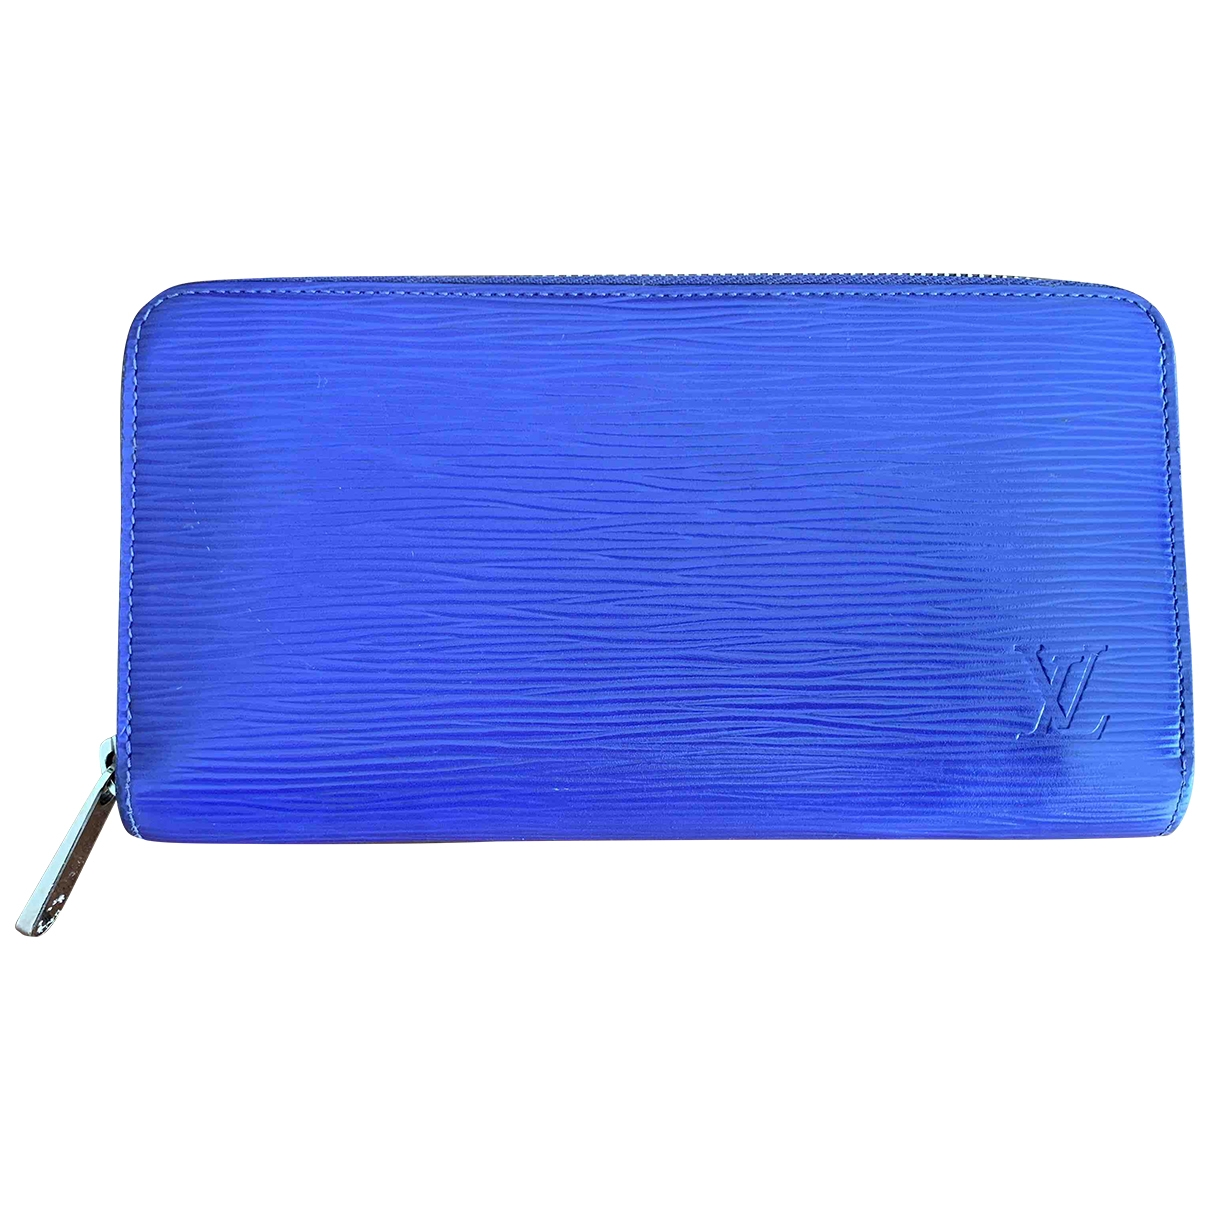 Louis Vuitton Zippy Blue Leather wallet for Women \N